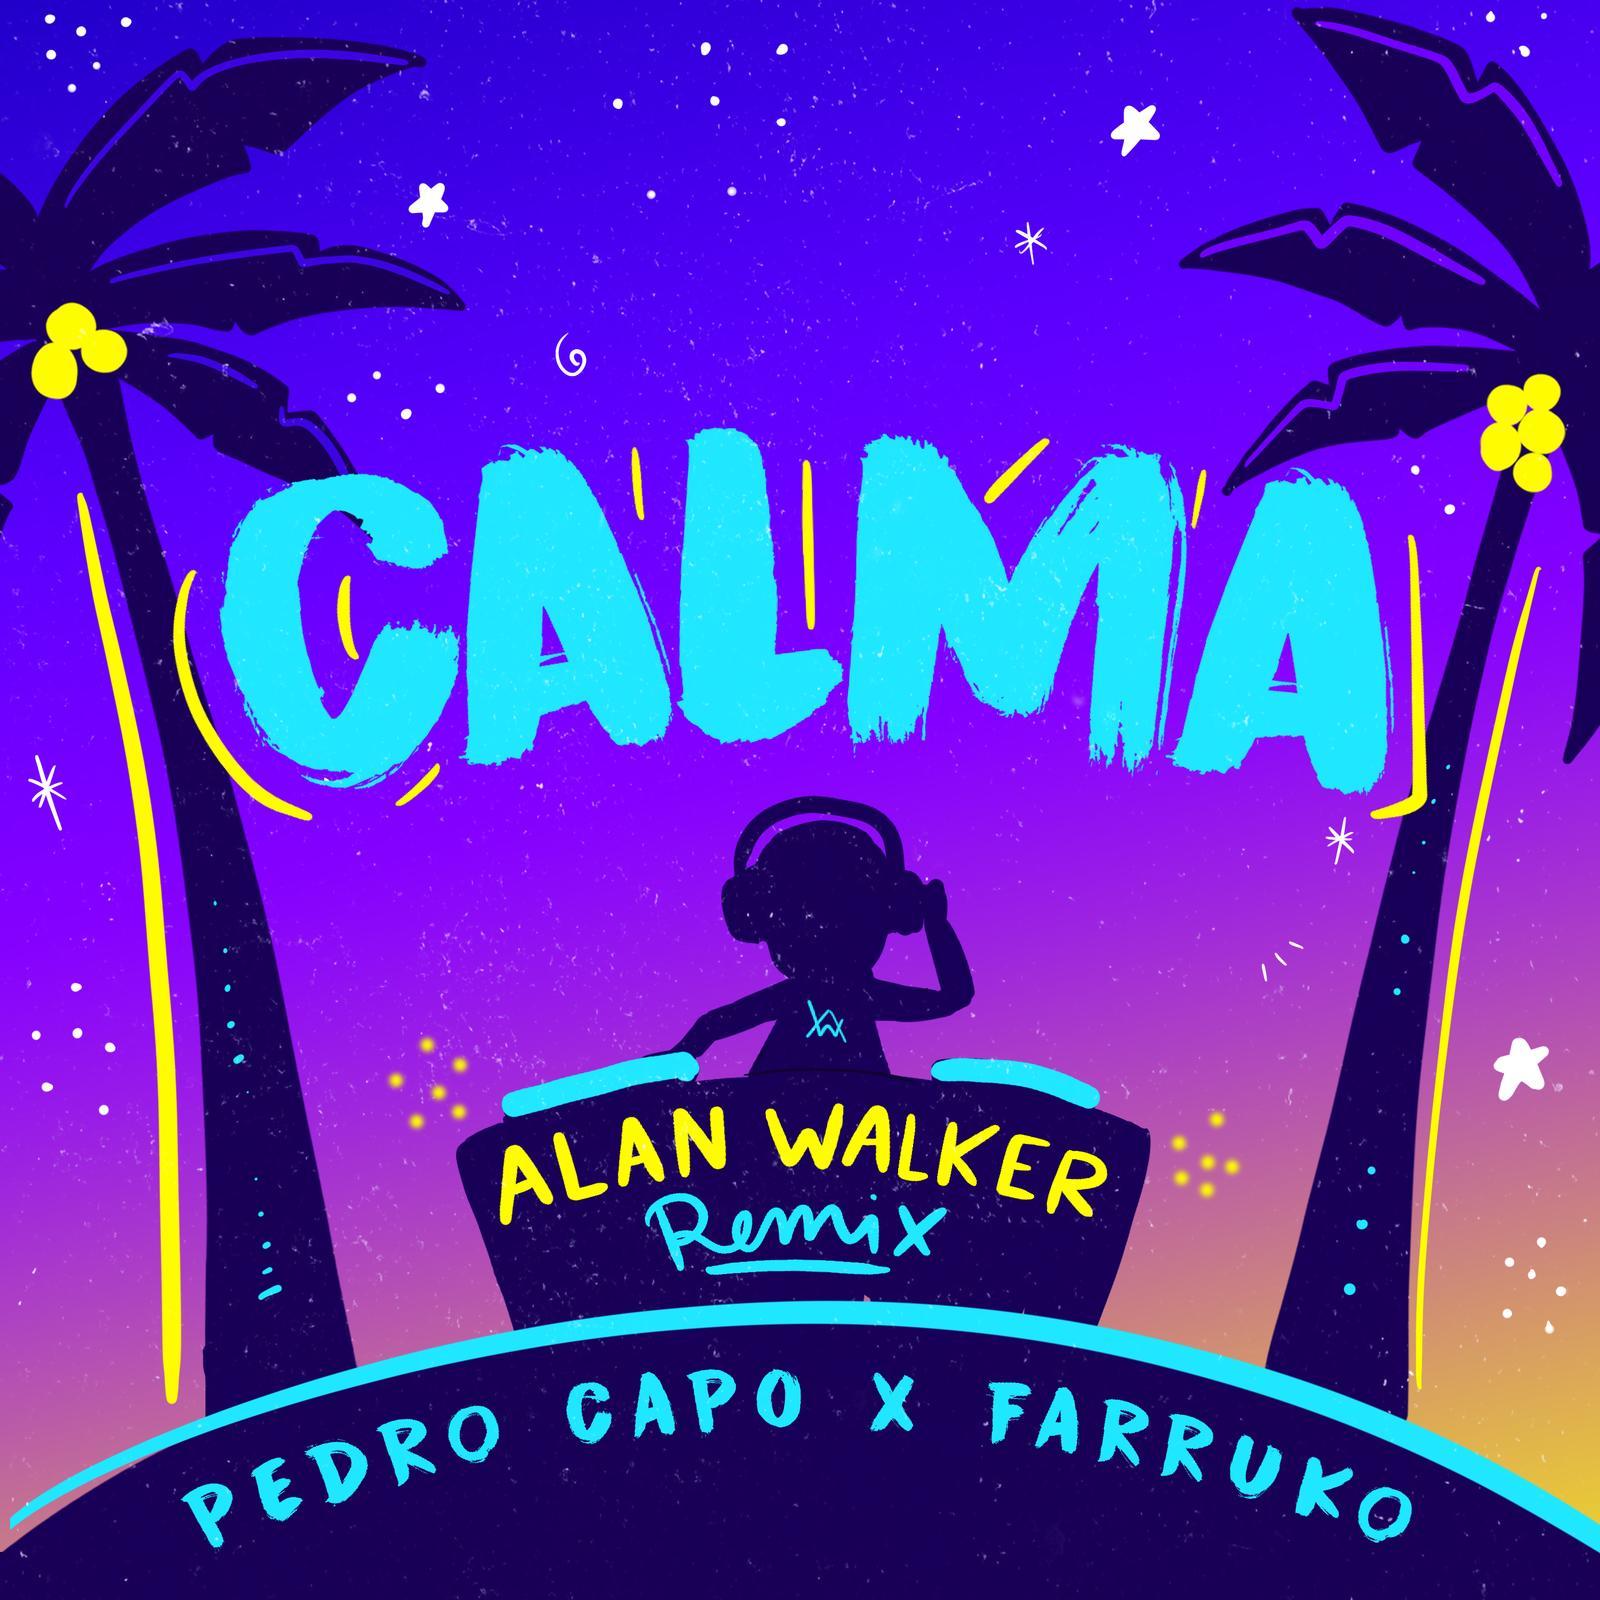 Calma (Alan Walker remix)